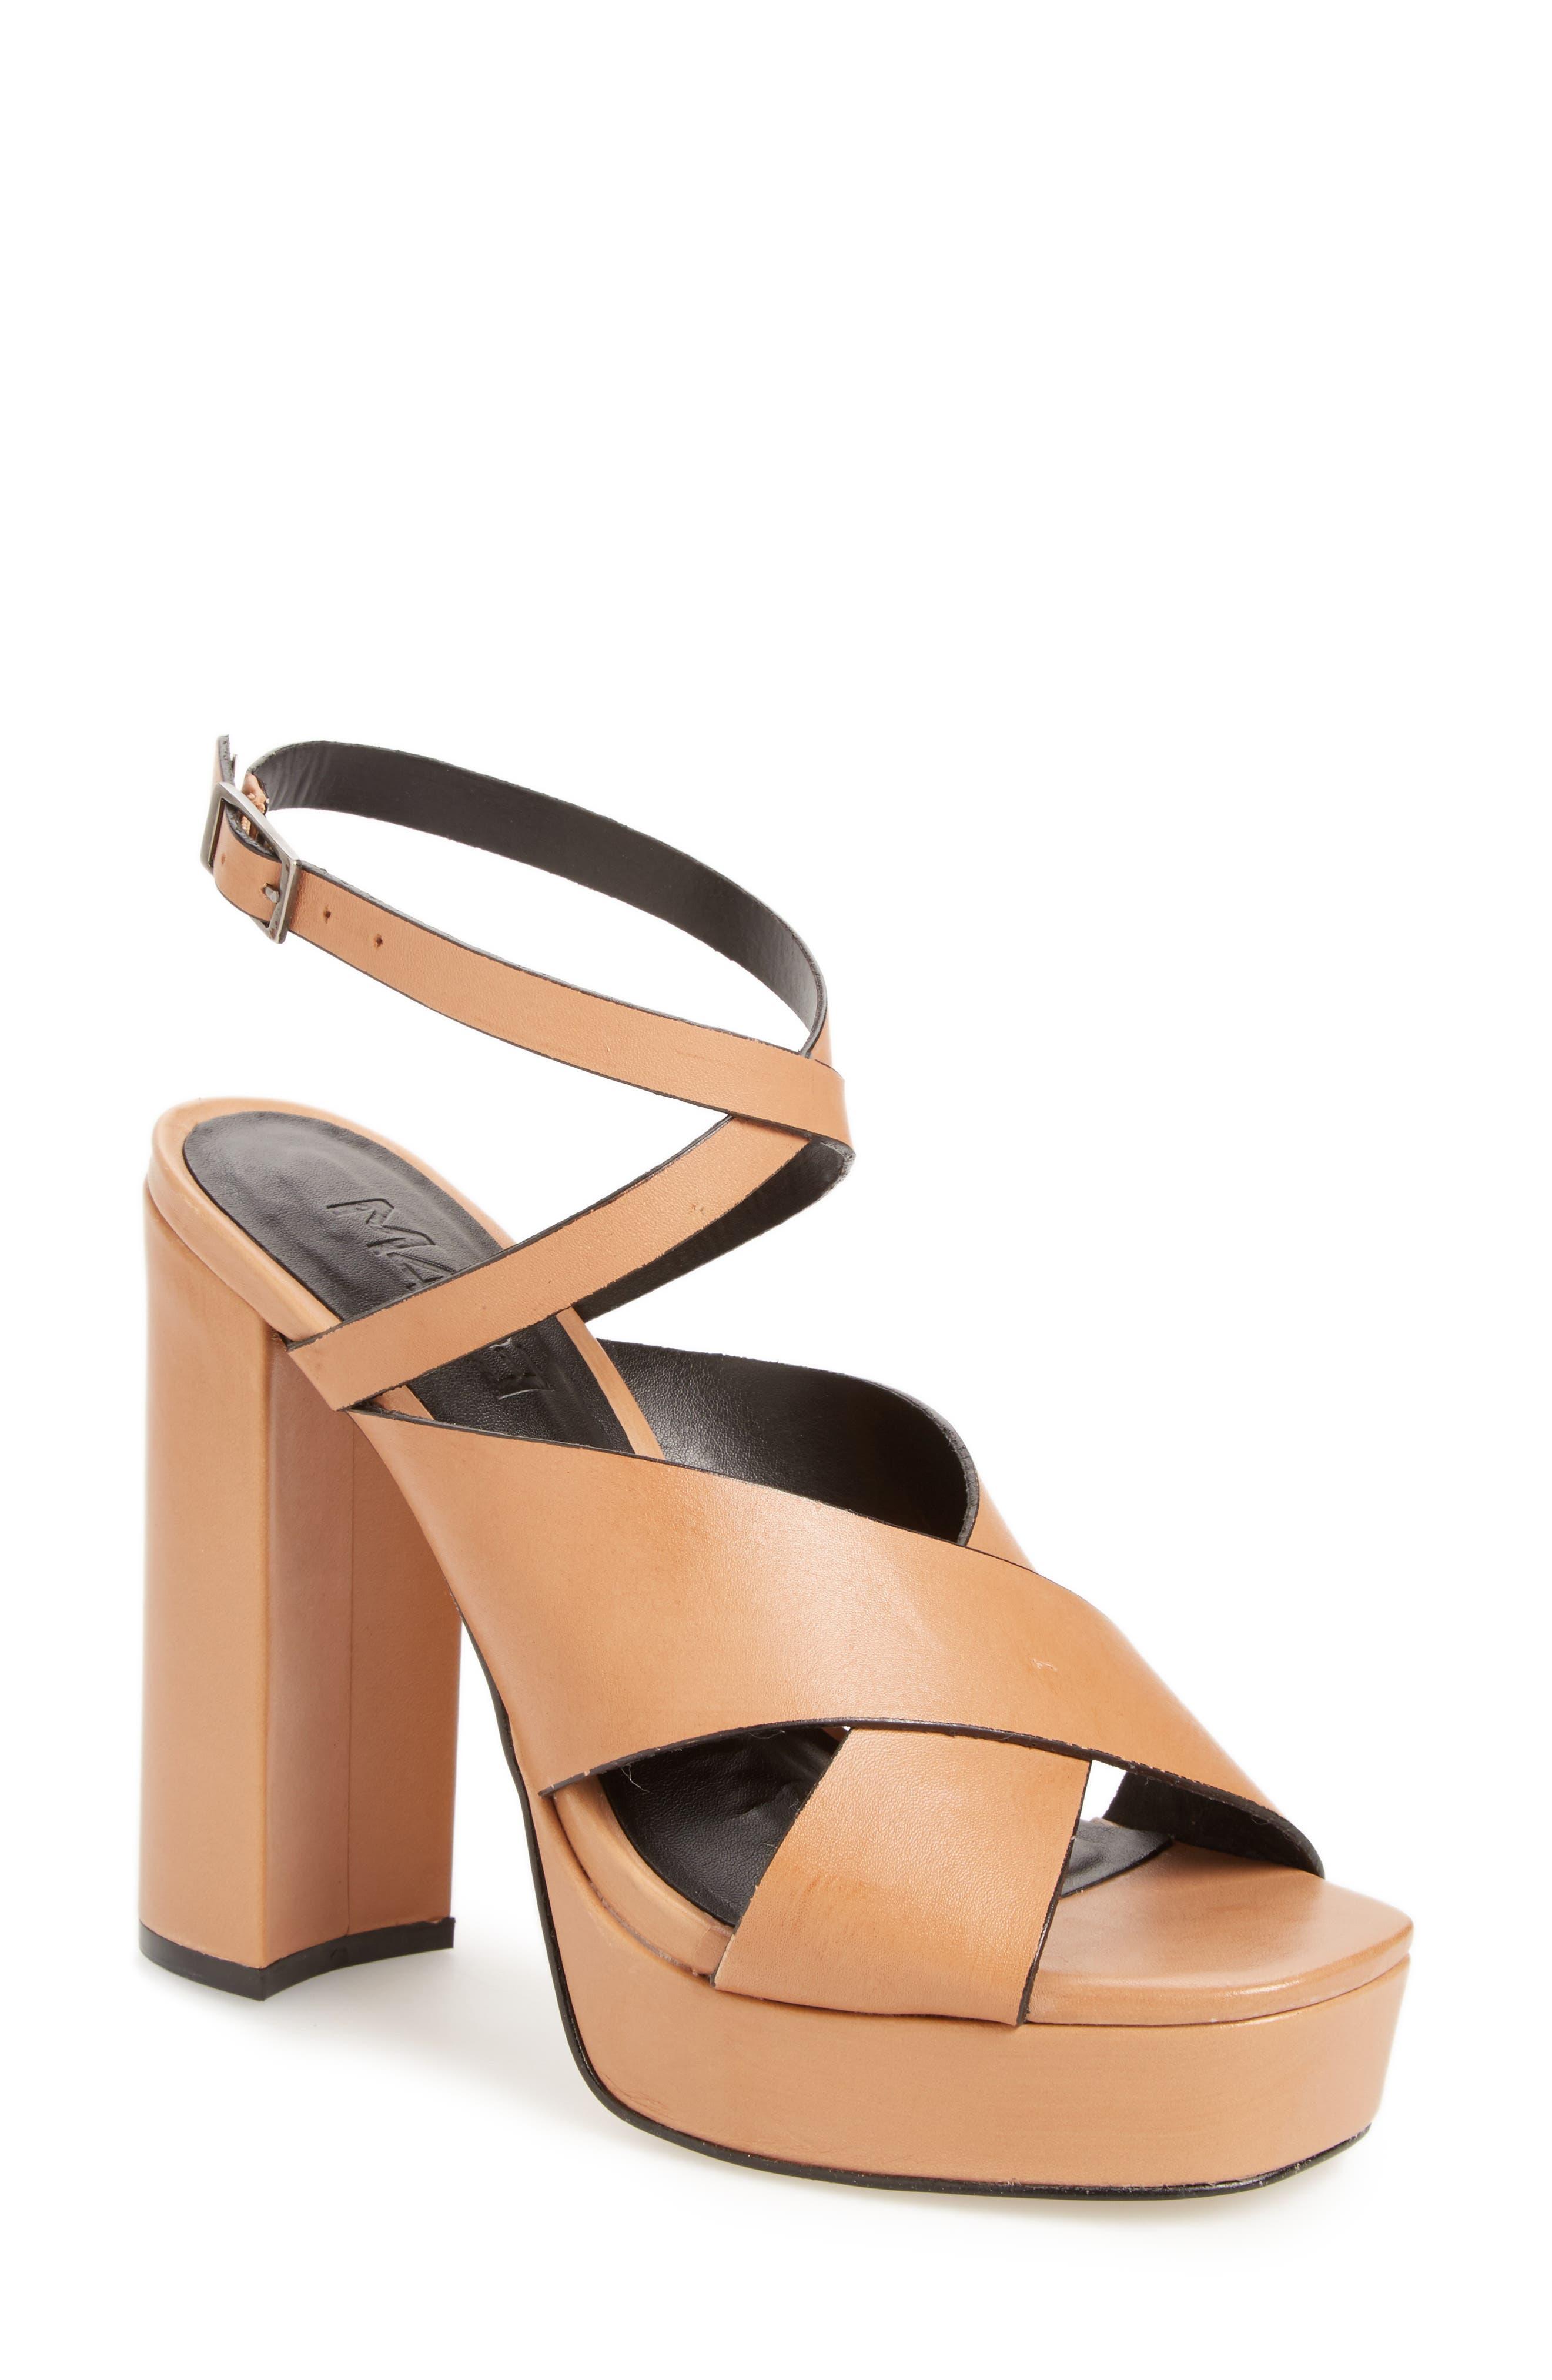 M4D3 Priscilla Wraparound Platform Sandal